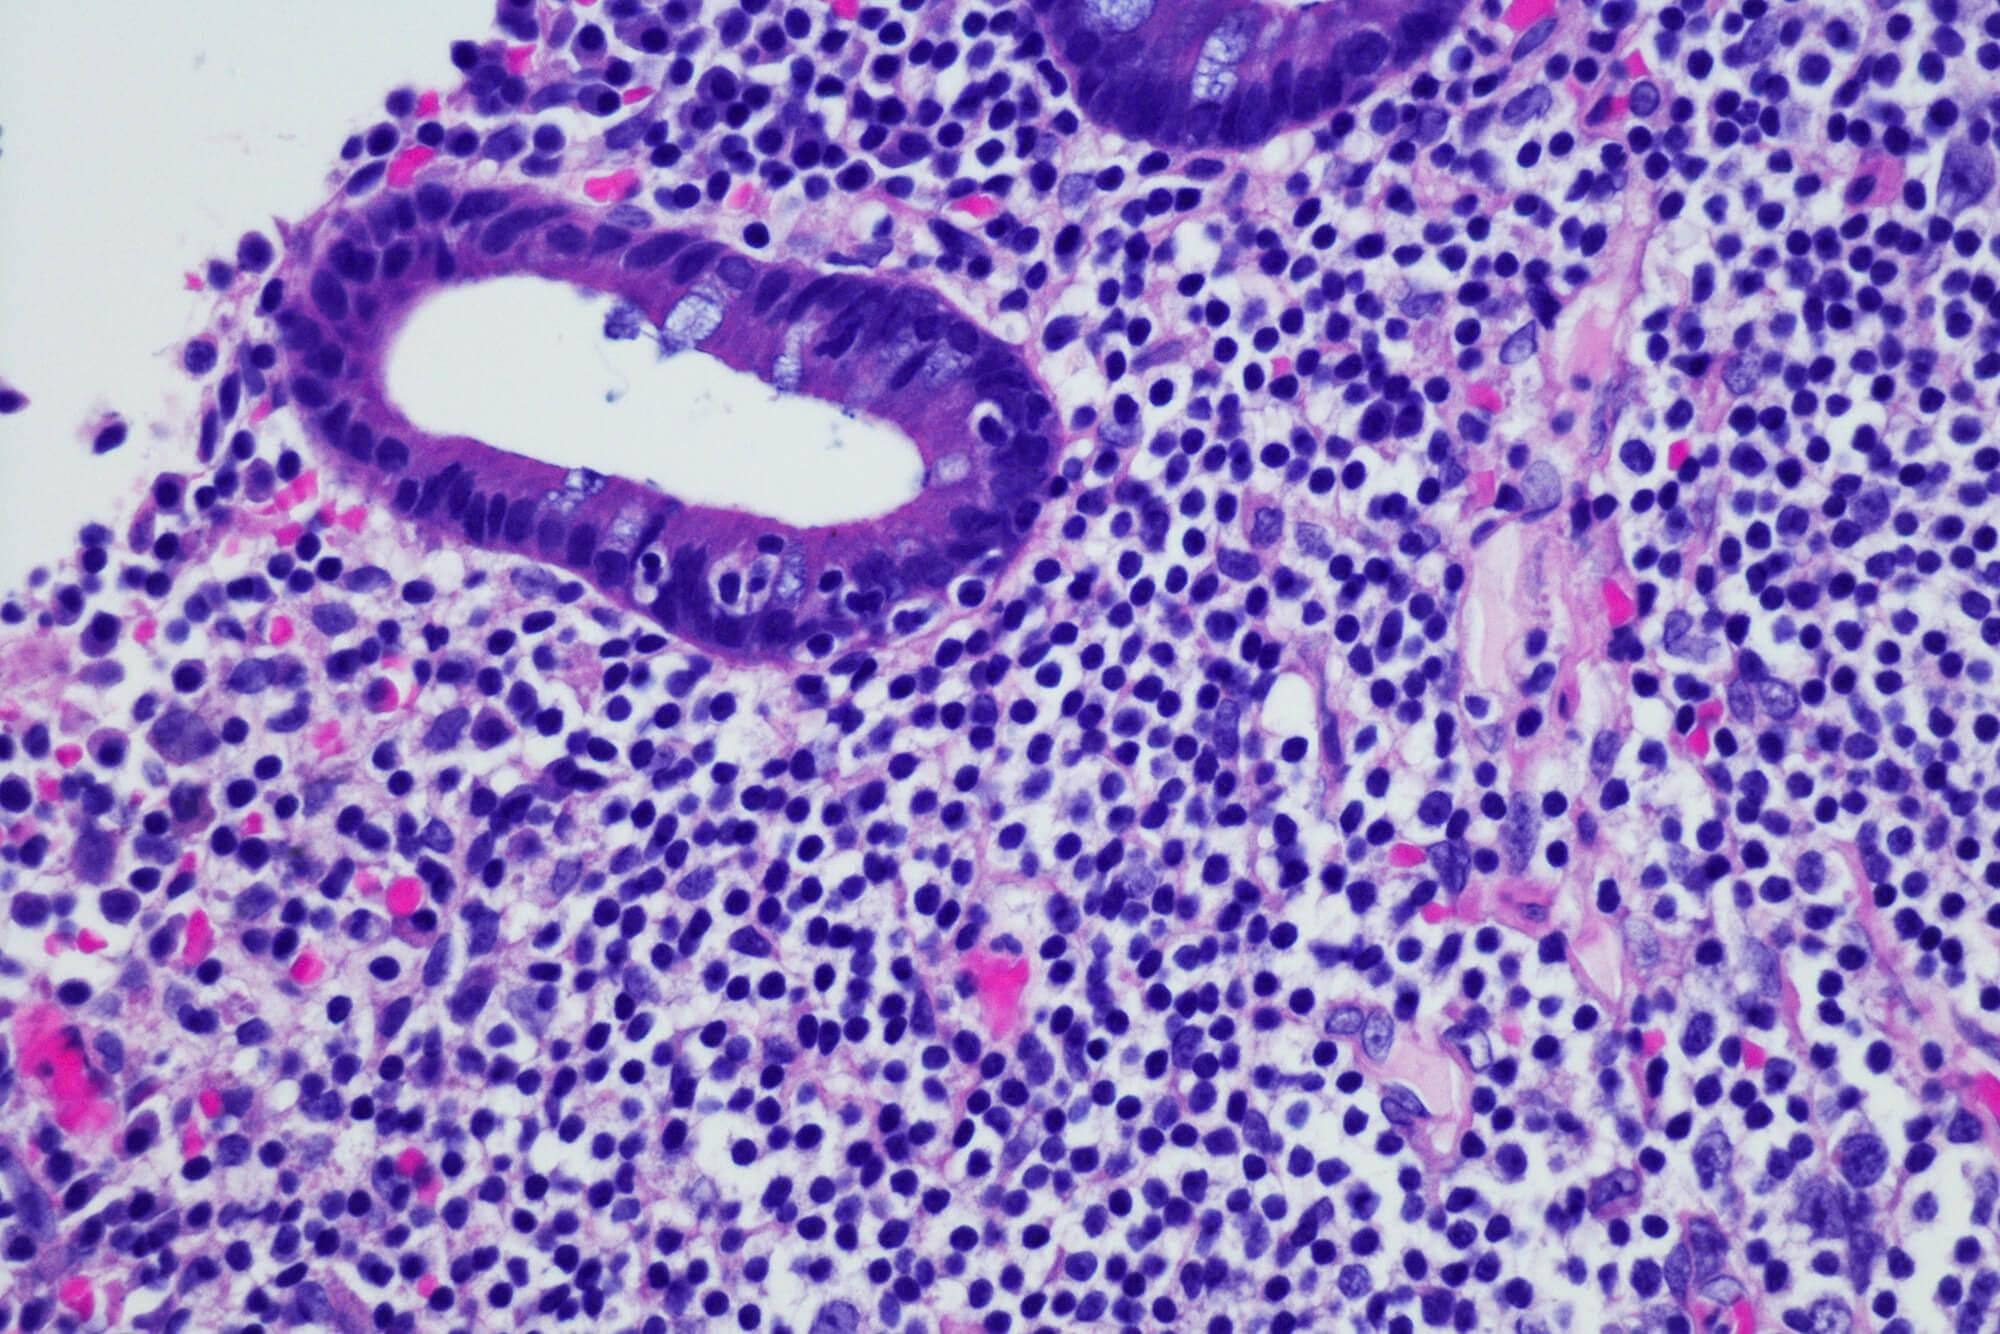 lymphoma - photo #22